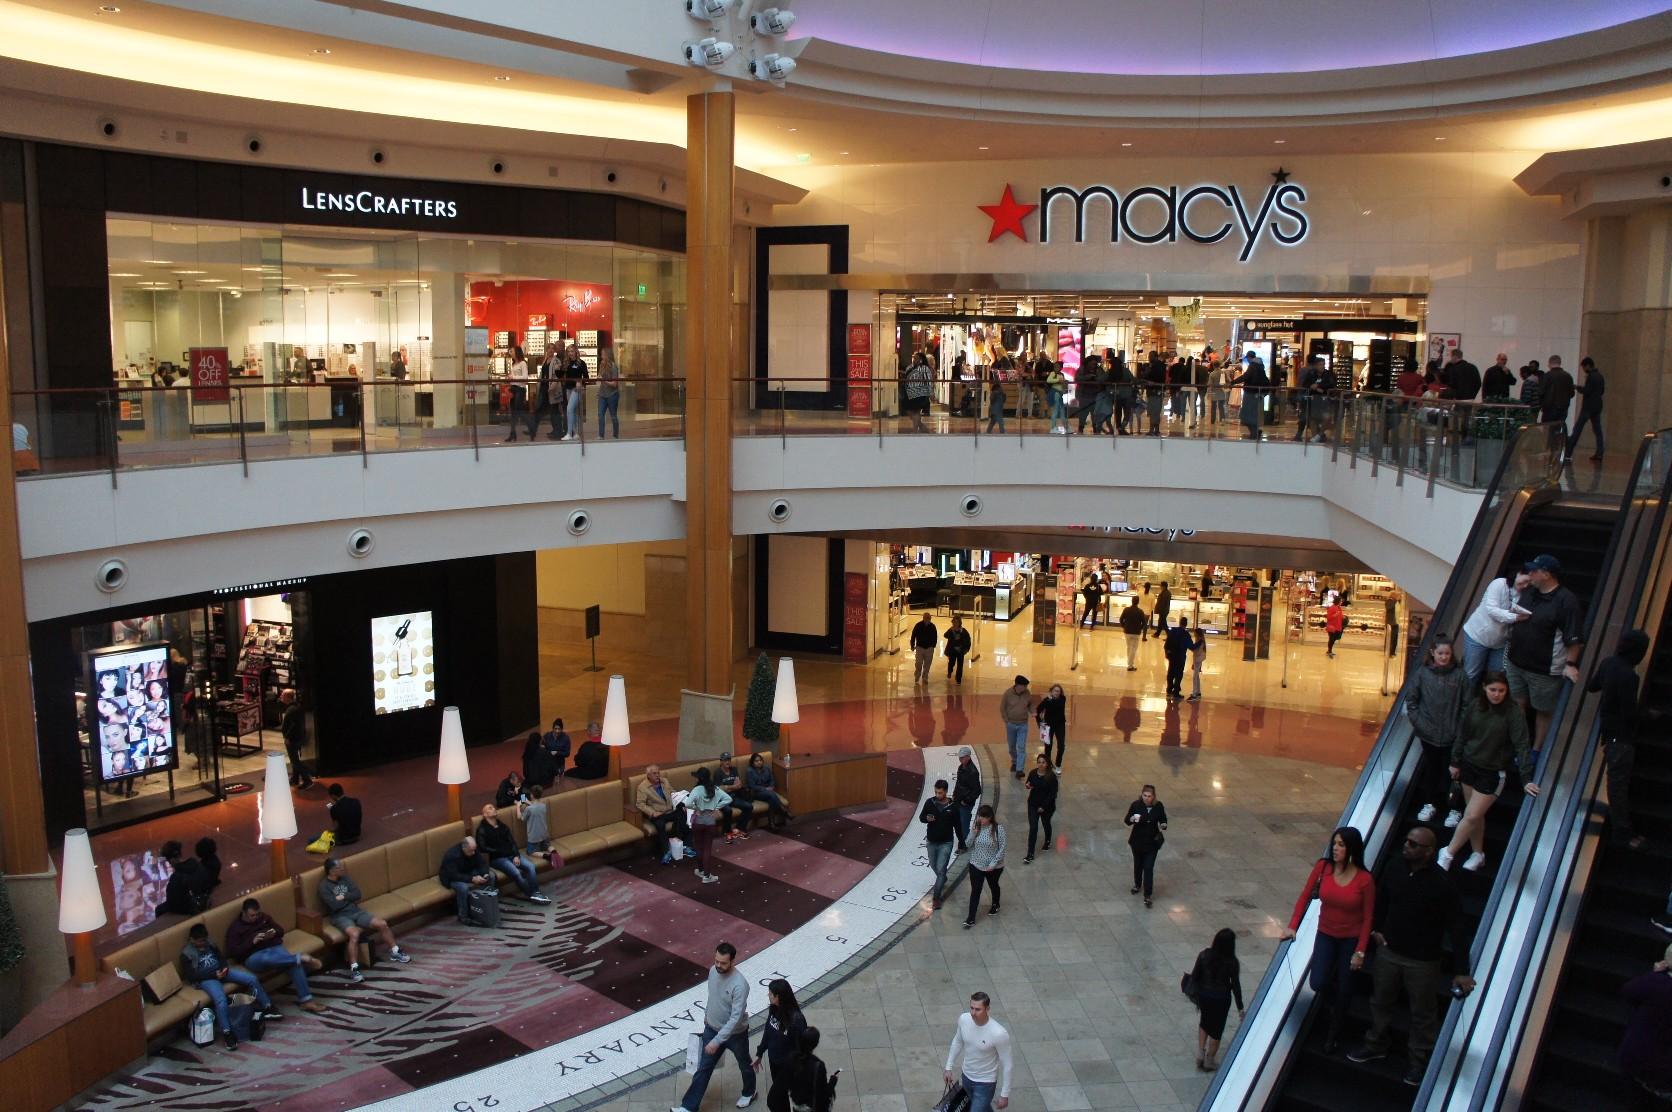 Orlando tourism to 4 large mall tour ③ Mall at Millenia